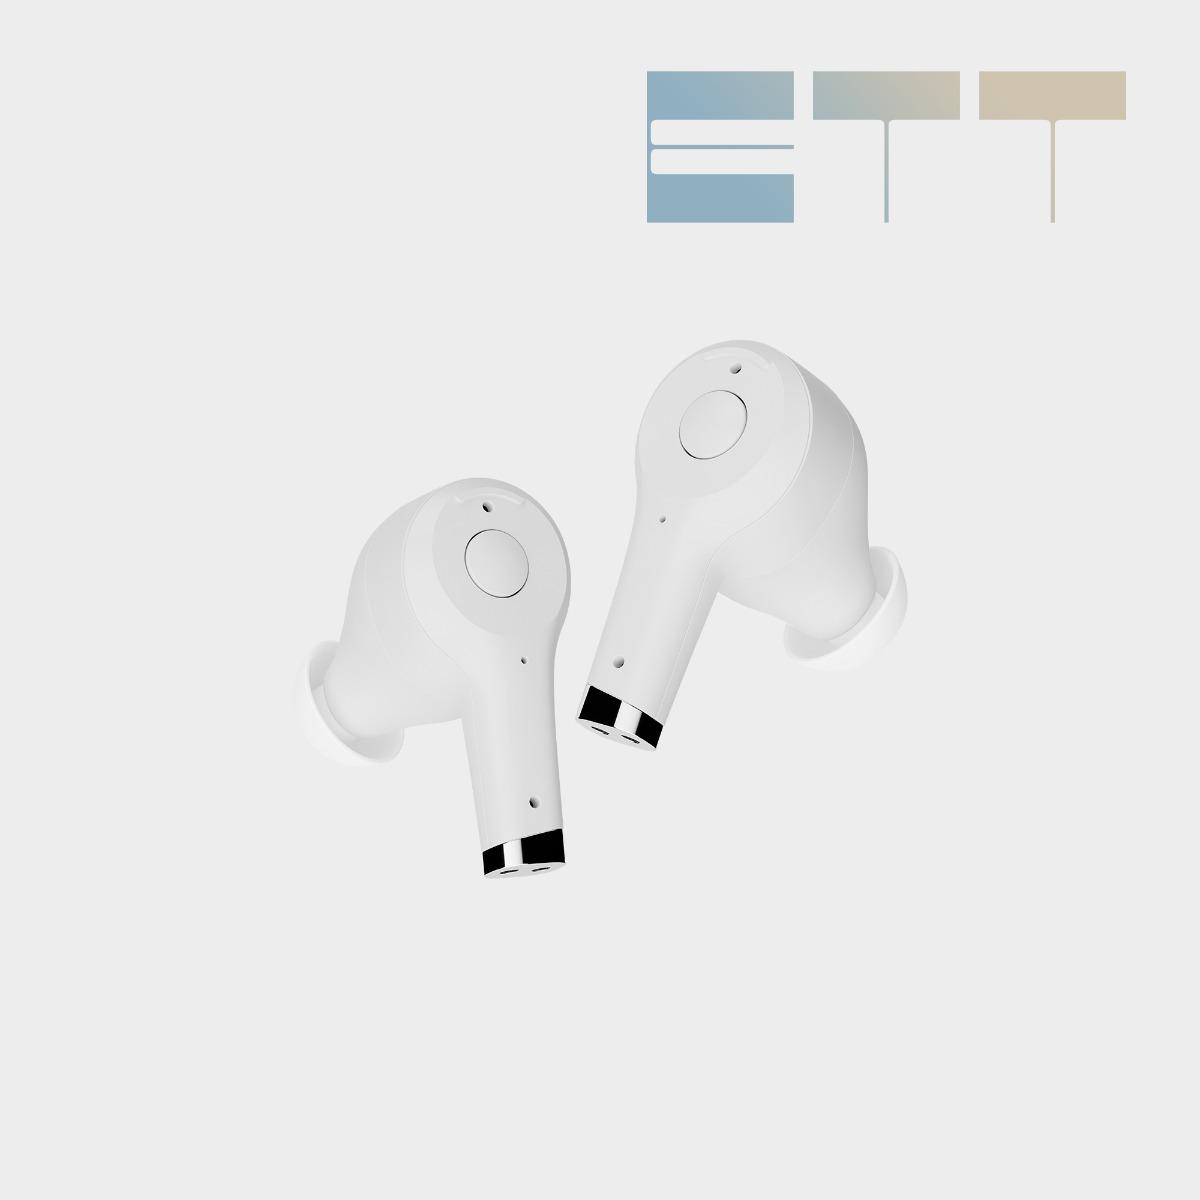 Sudio Ett 入耳式耳機 藍芽耳機 無線 IPX5 主動降噪功能